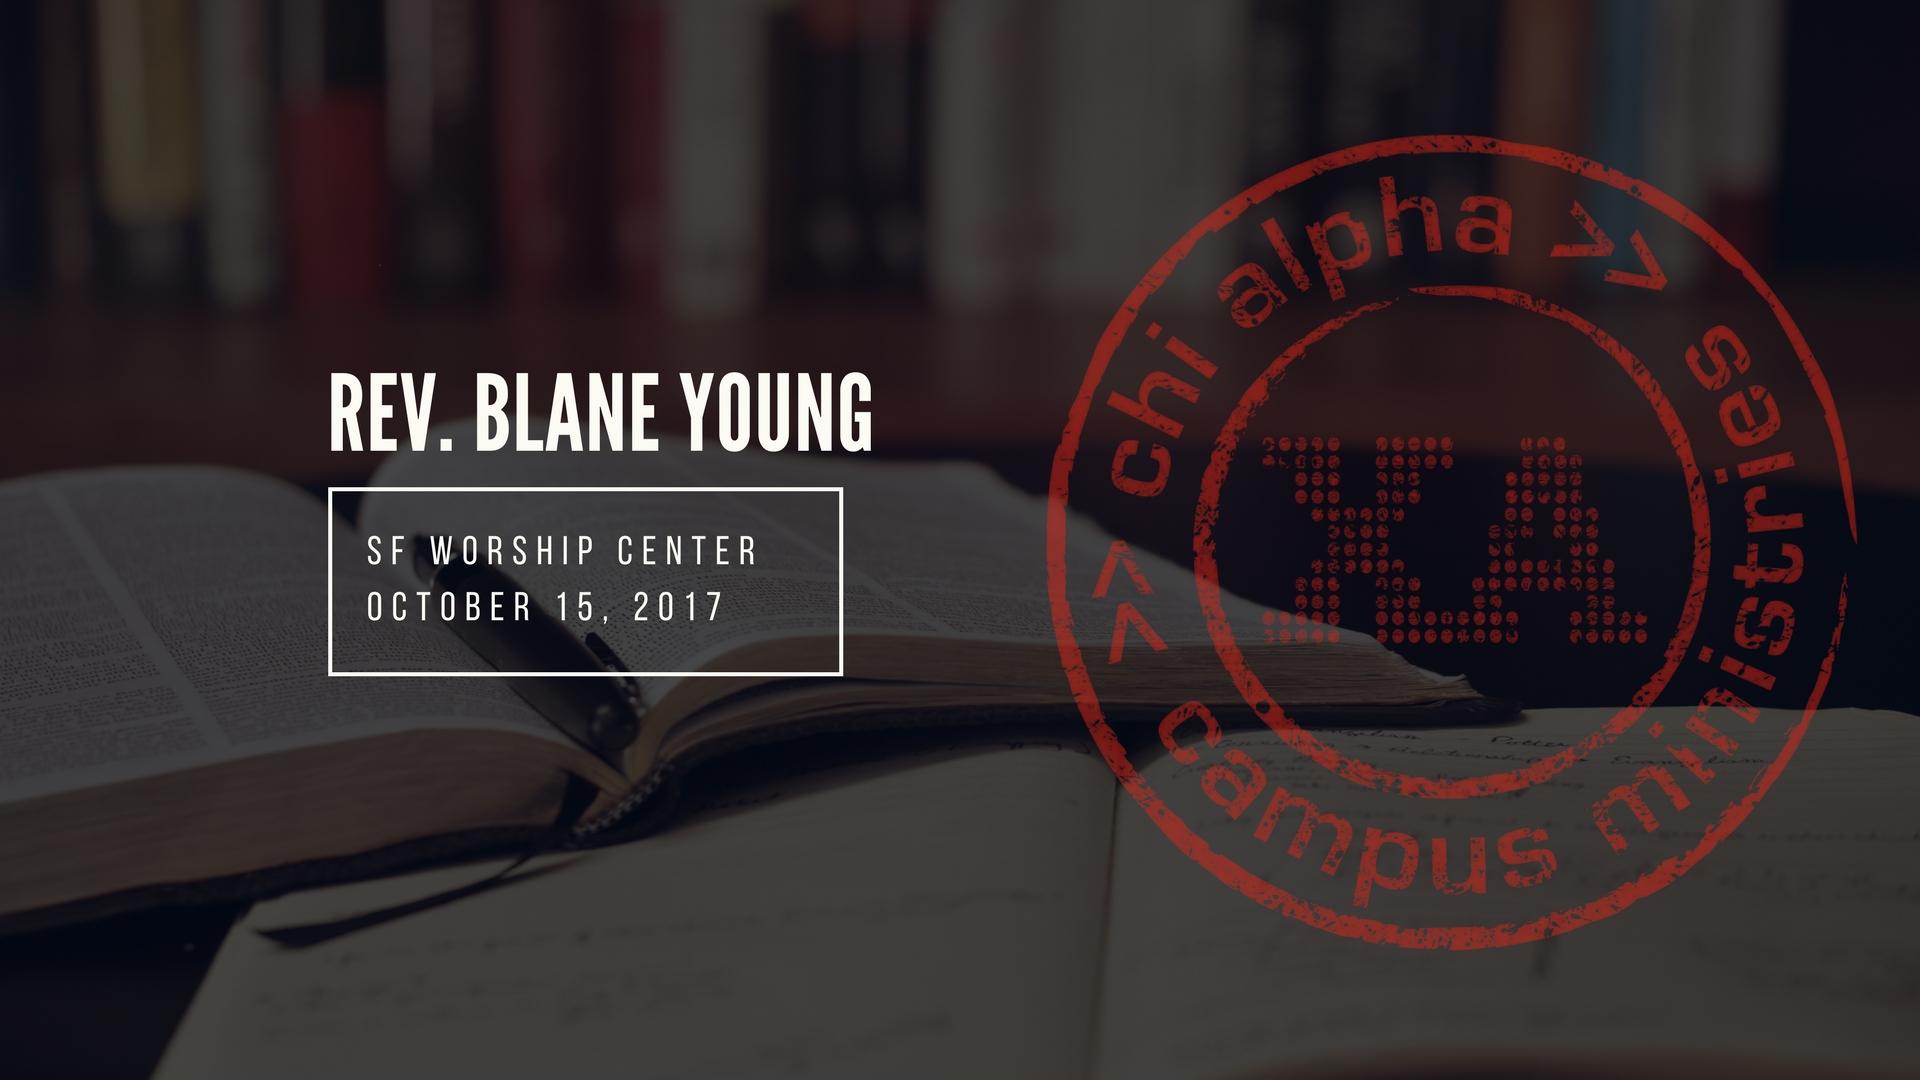 Copy of Blane - Sermon Content.jpg